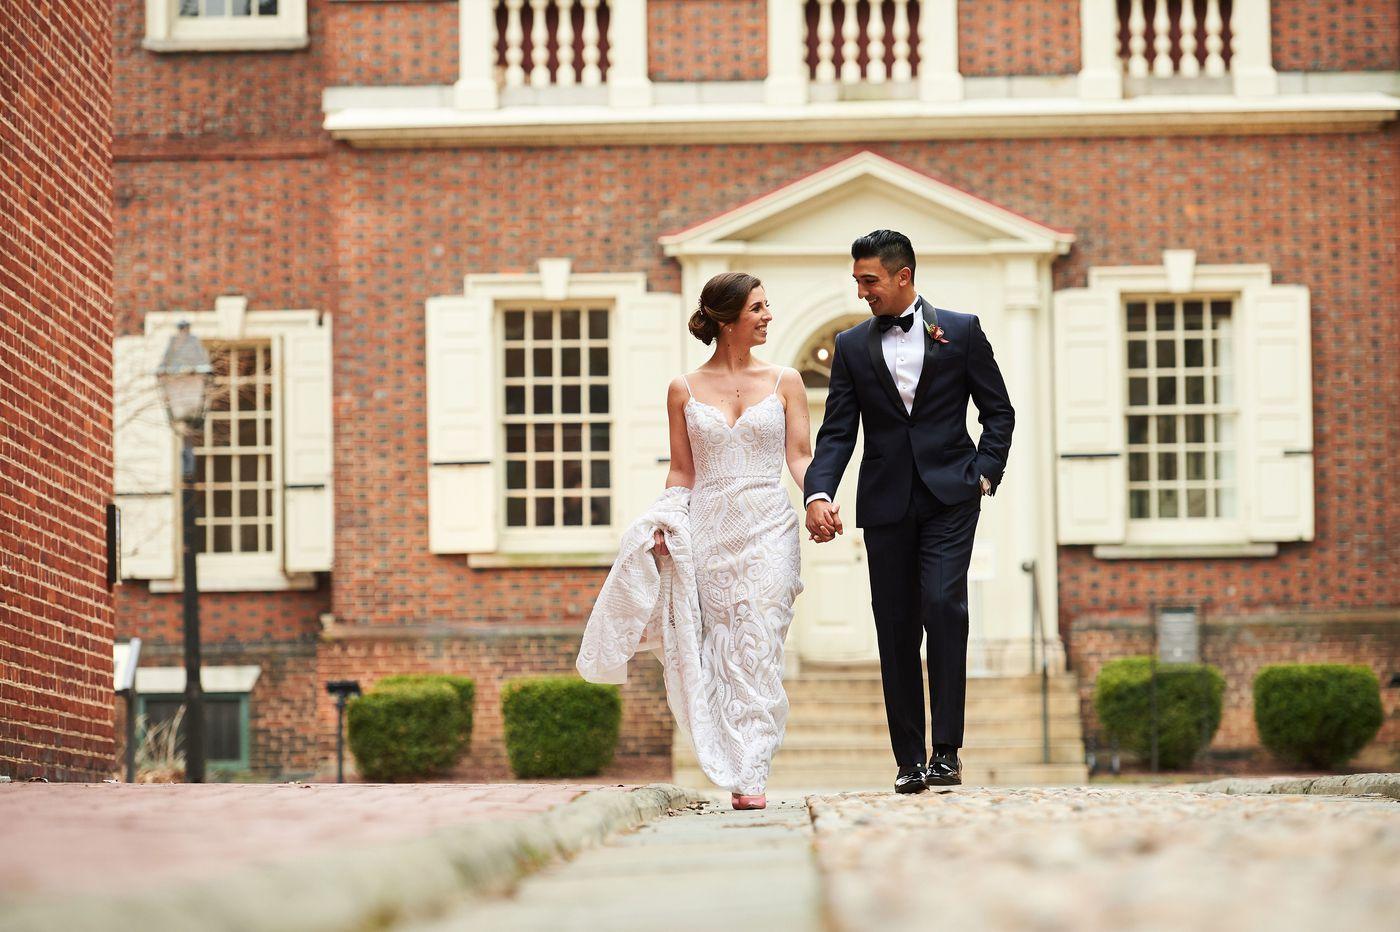 Philadelphia weddings: Stephanie Consoli and Mauricio Cruz